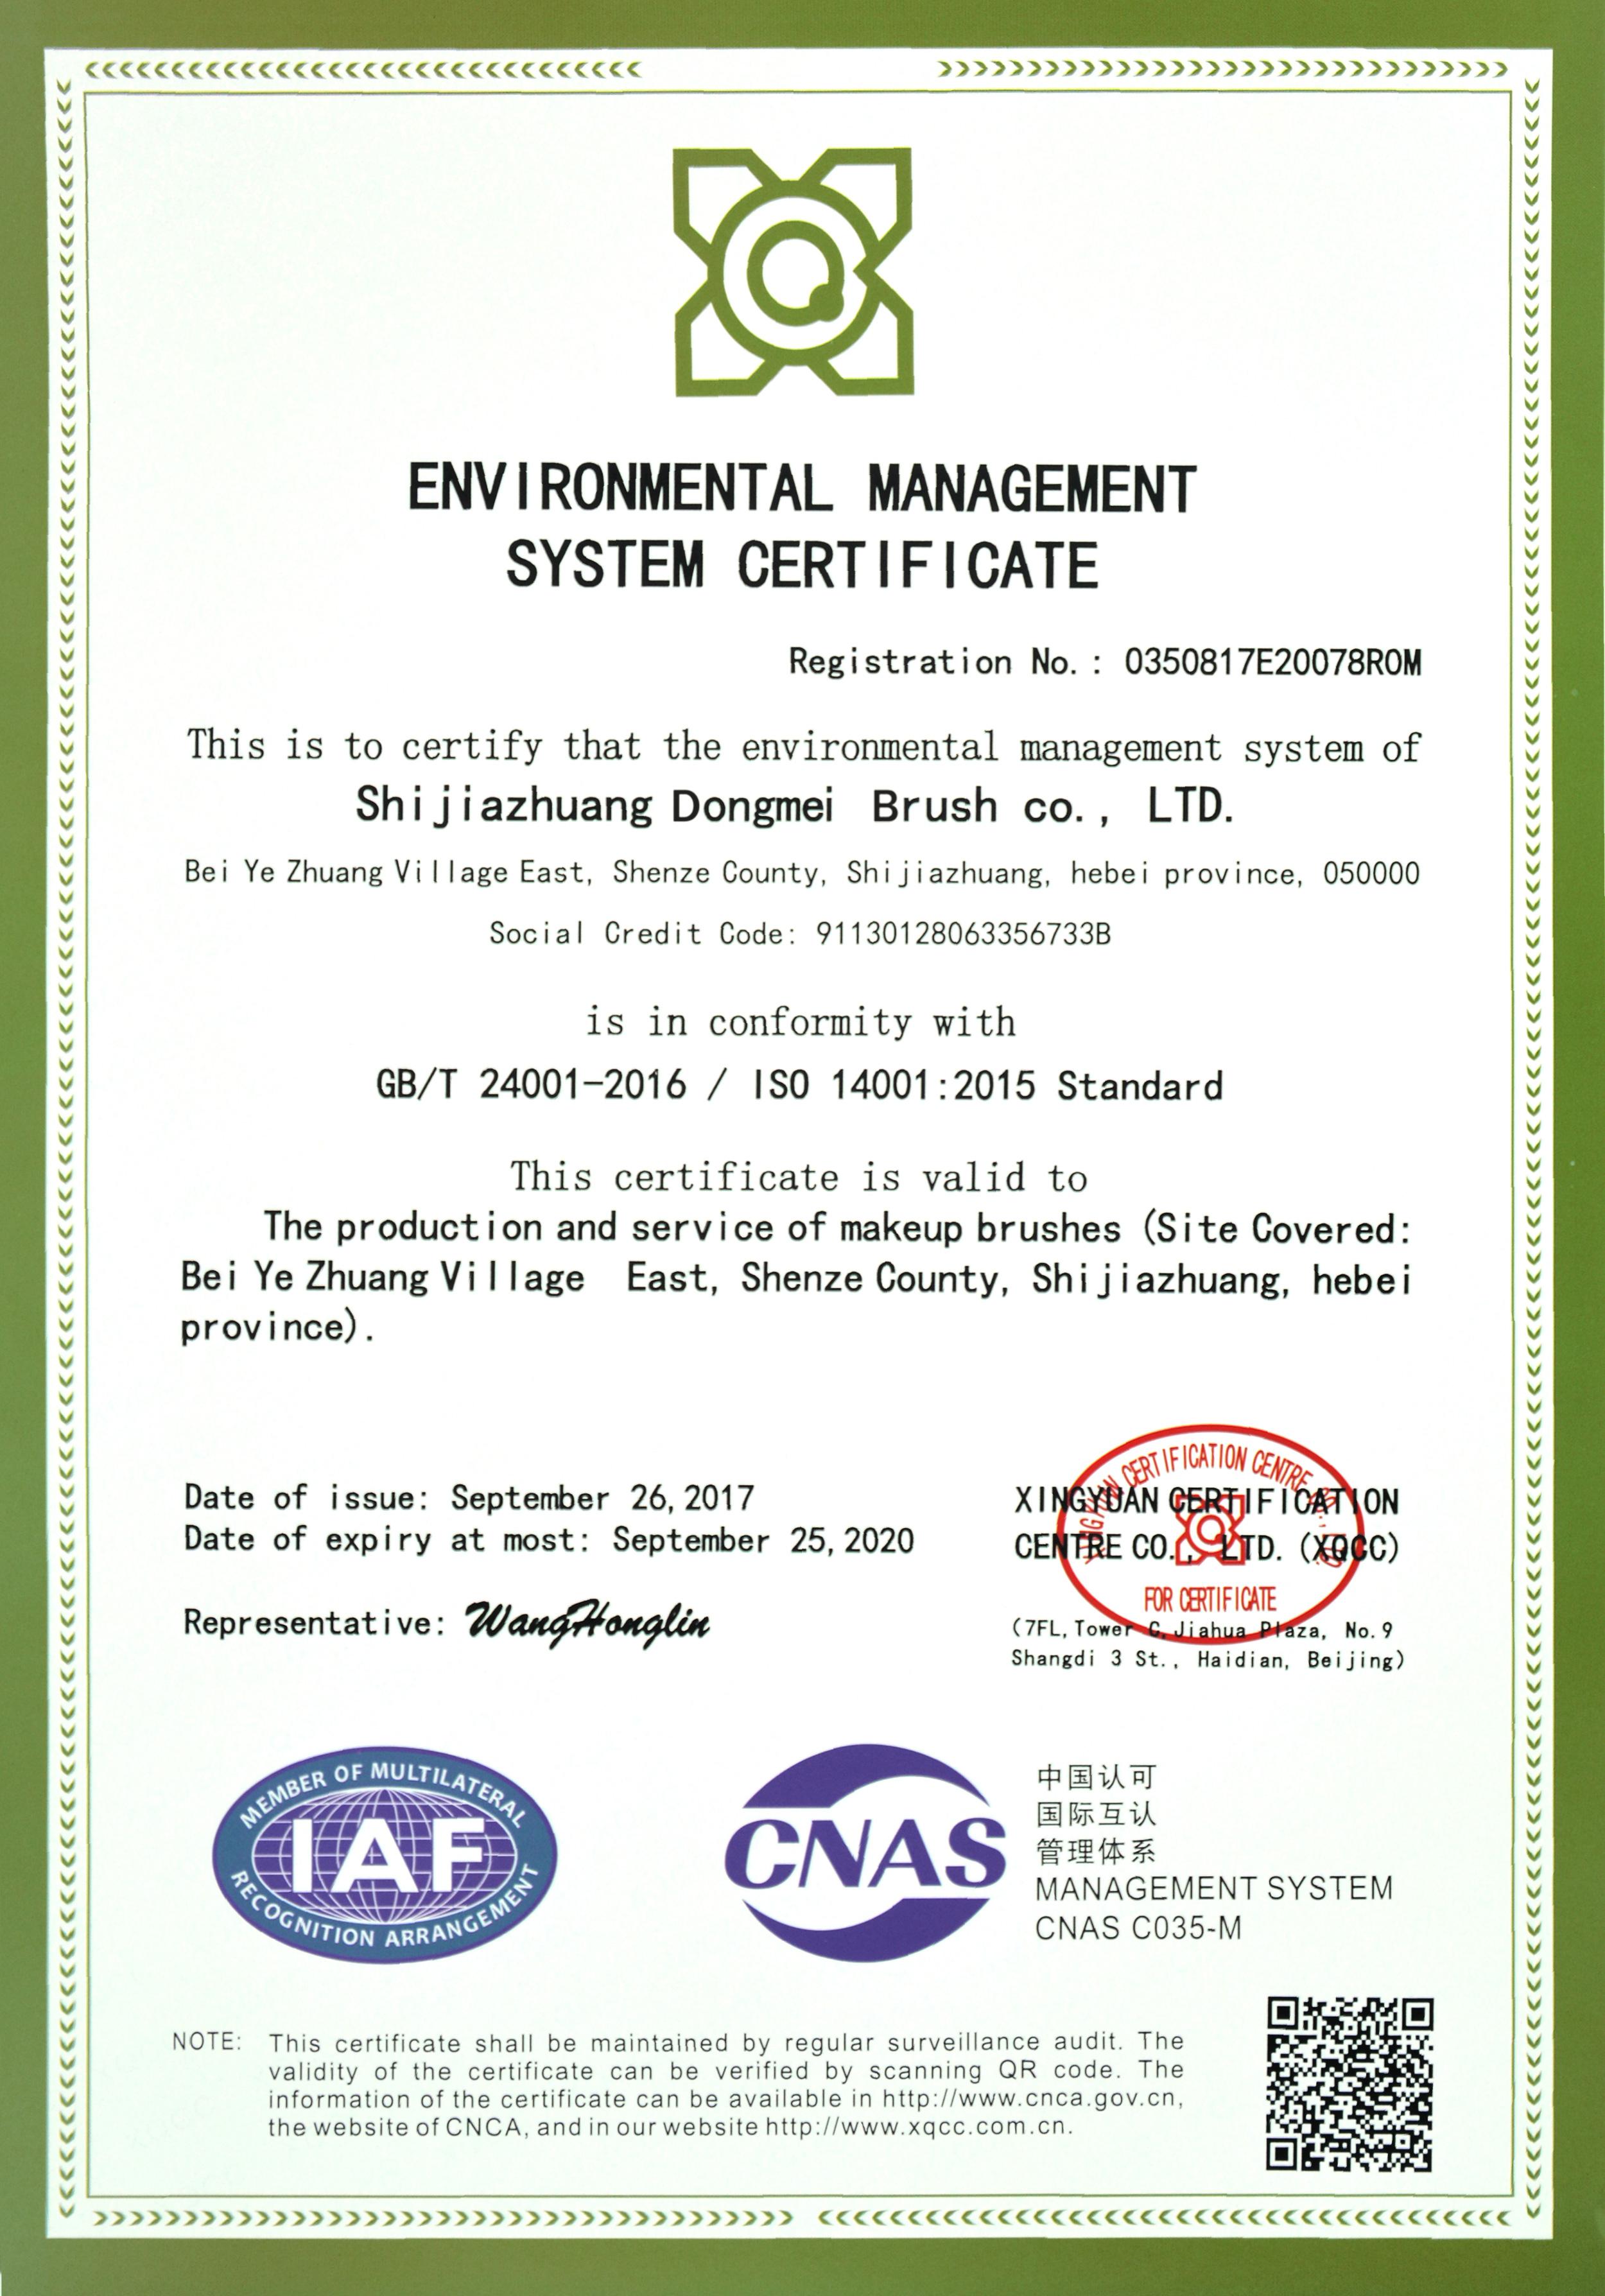 ISO14001--ENVIROMENTAL MANAGEMENT SYSTEM CERTIFICATE